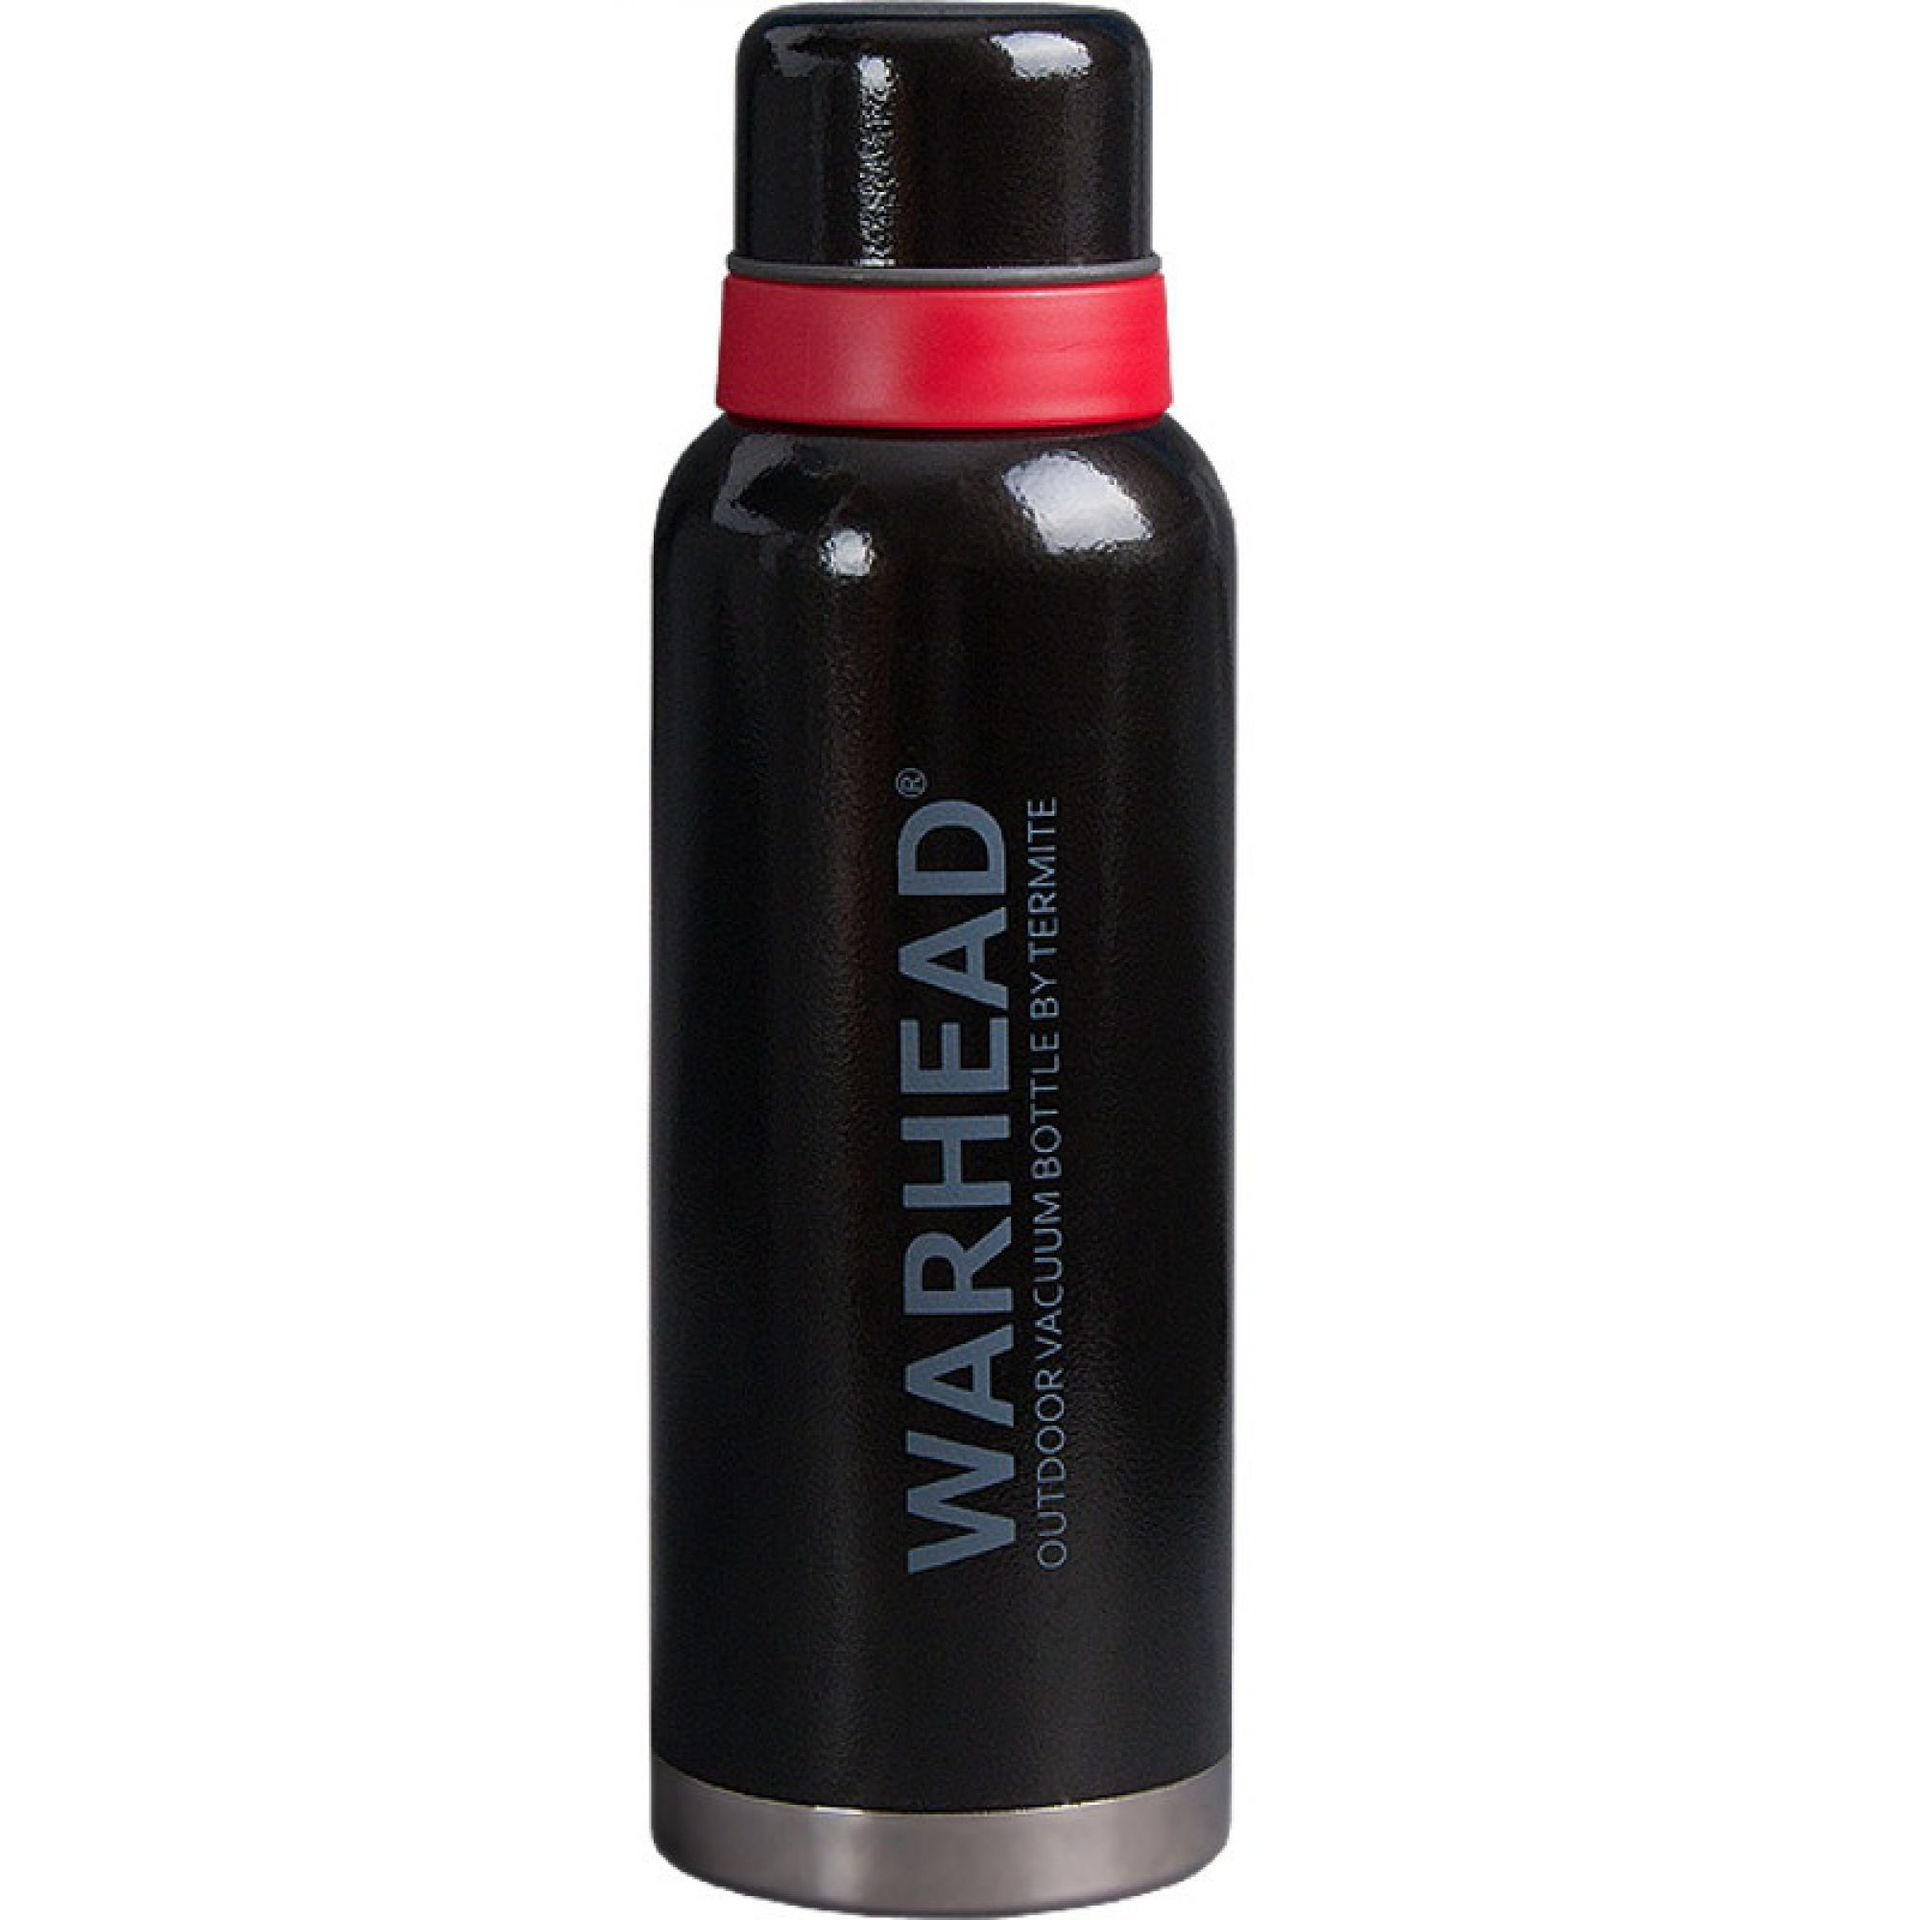 TERMOS TERMITE WARHEAD 1,2 L HAMMERTONE